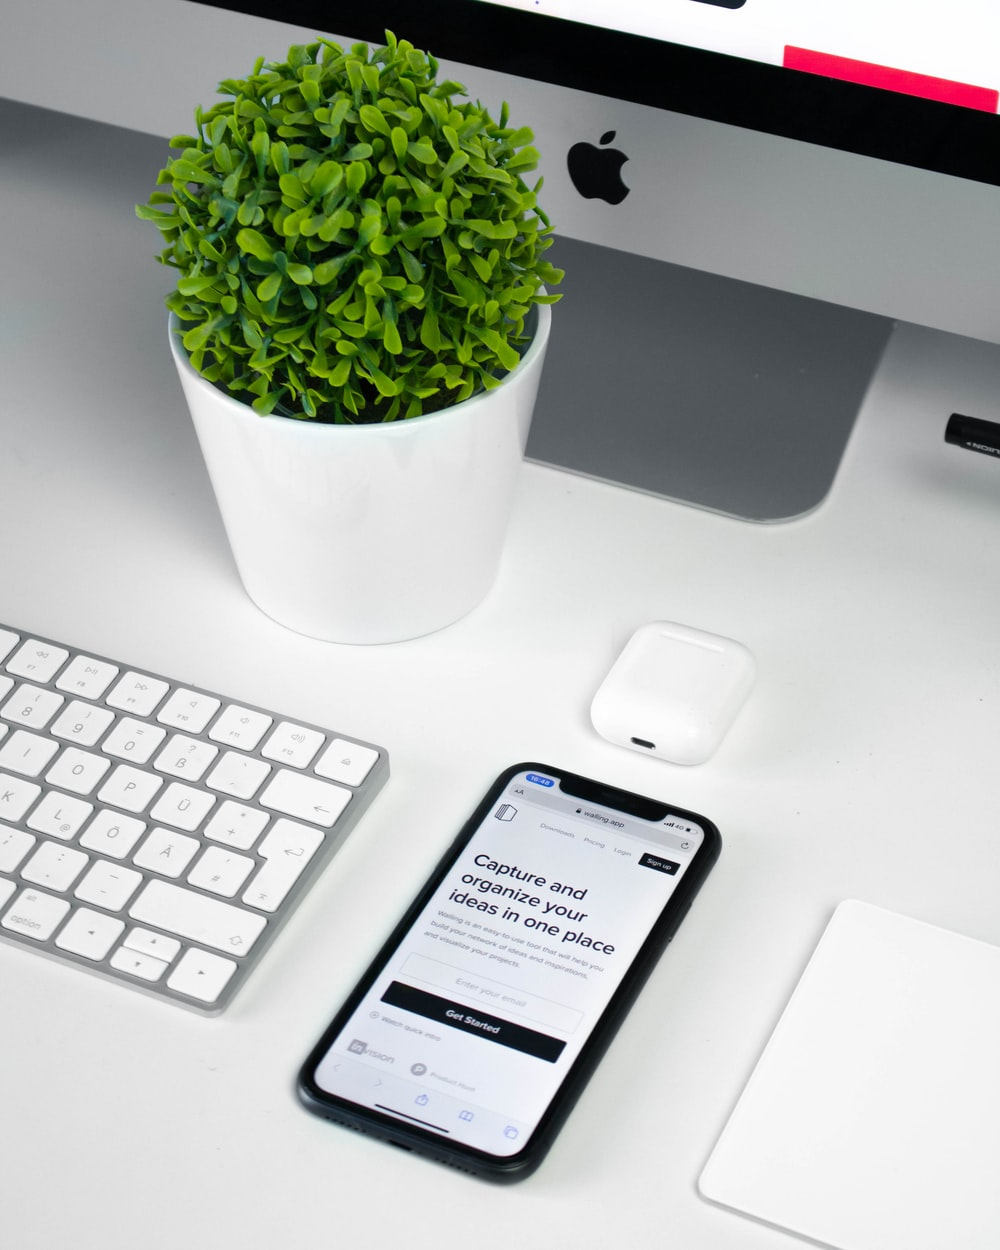 silver iphone 6 beside white apple keyboard